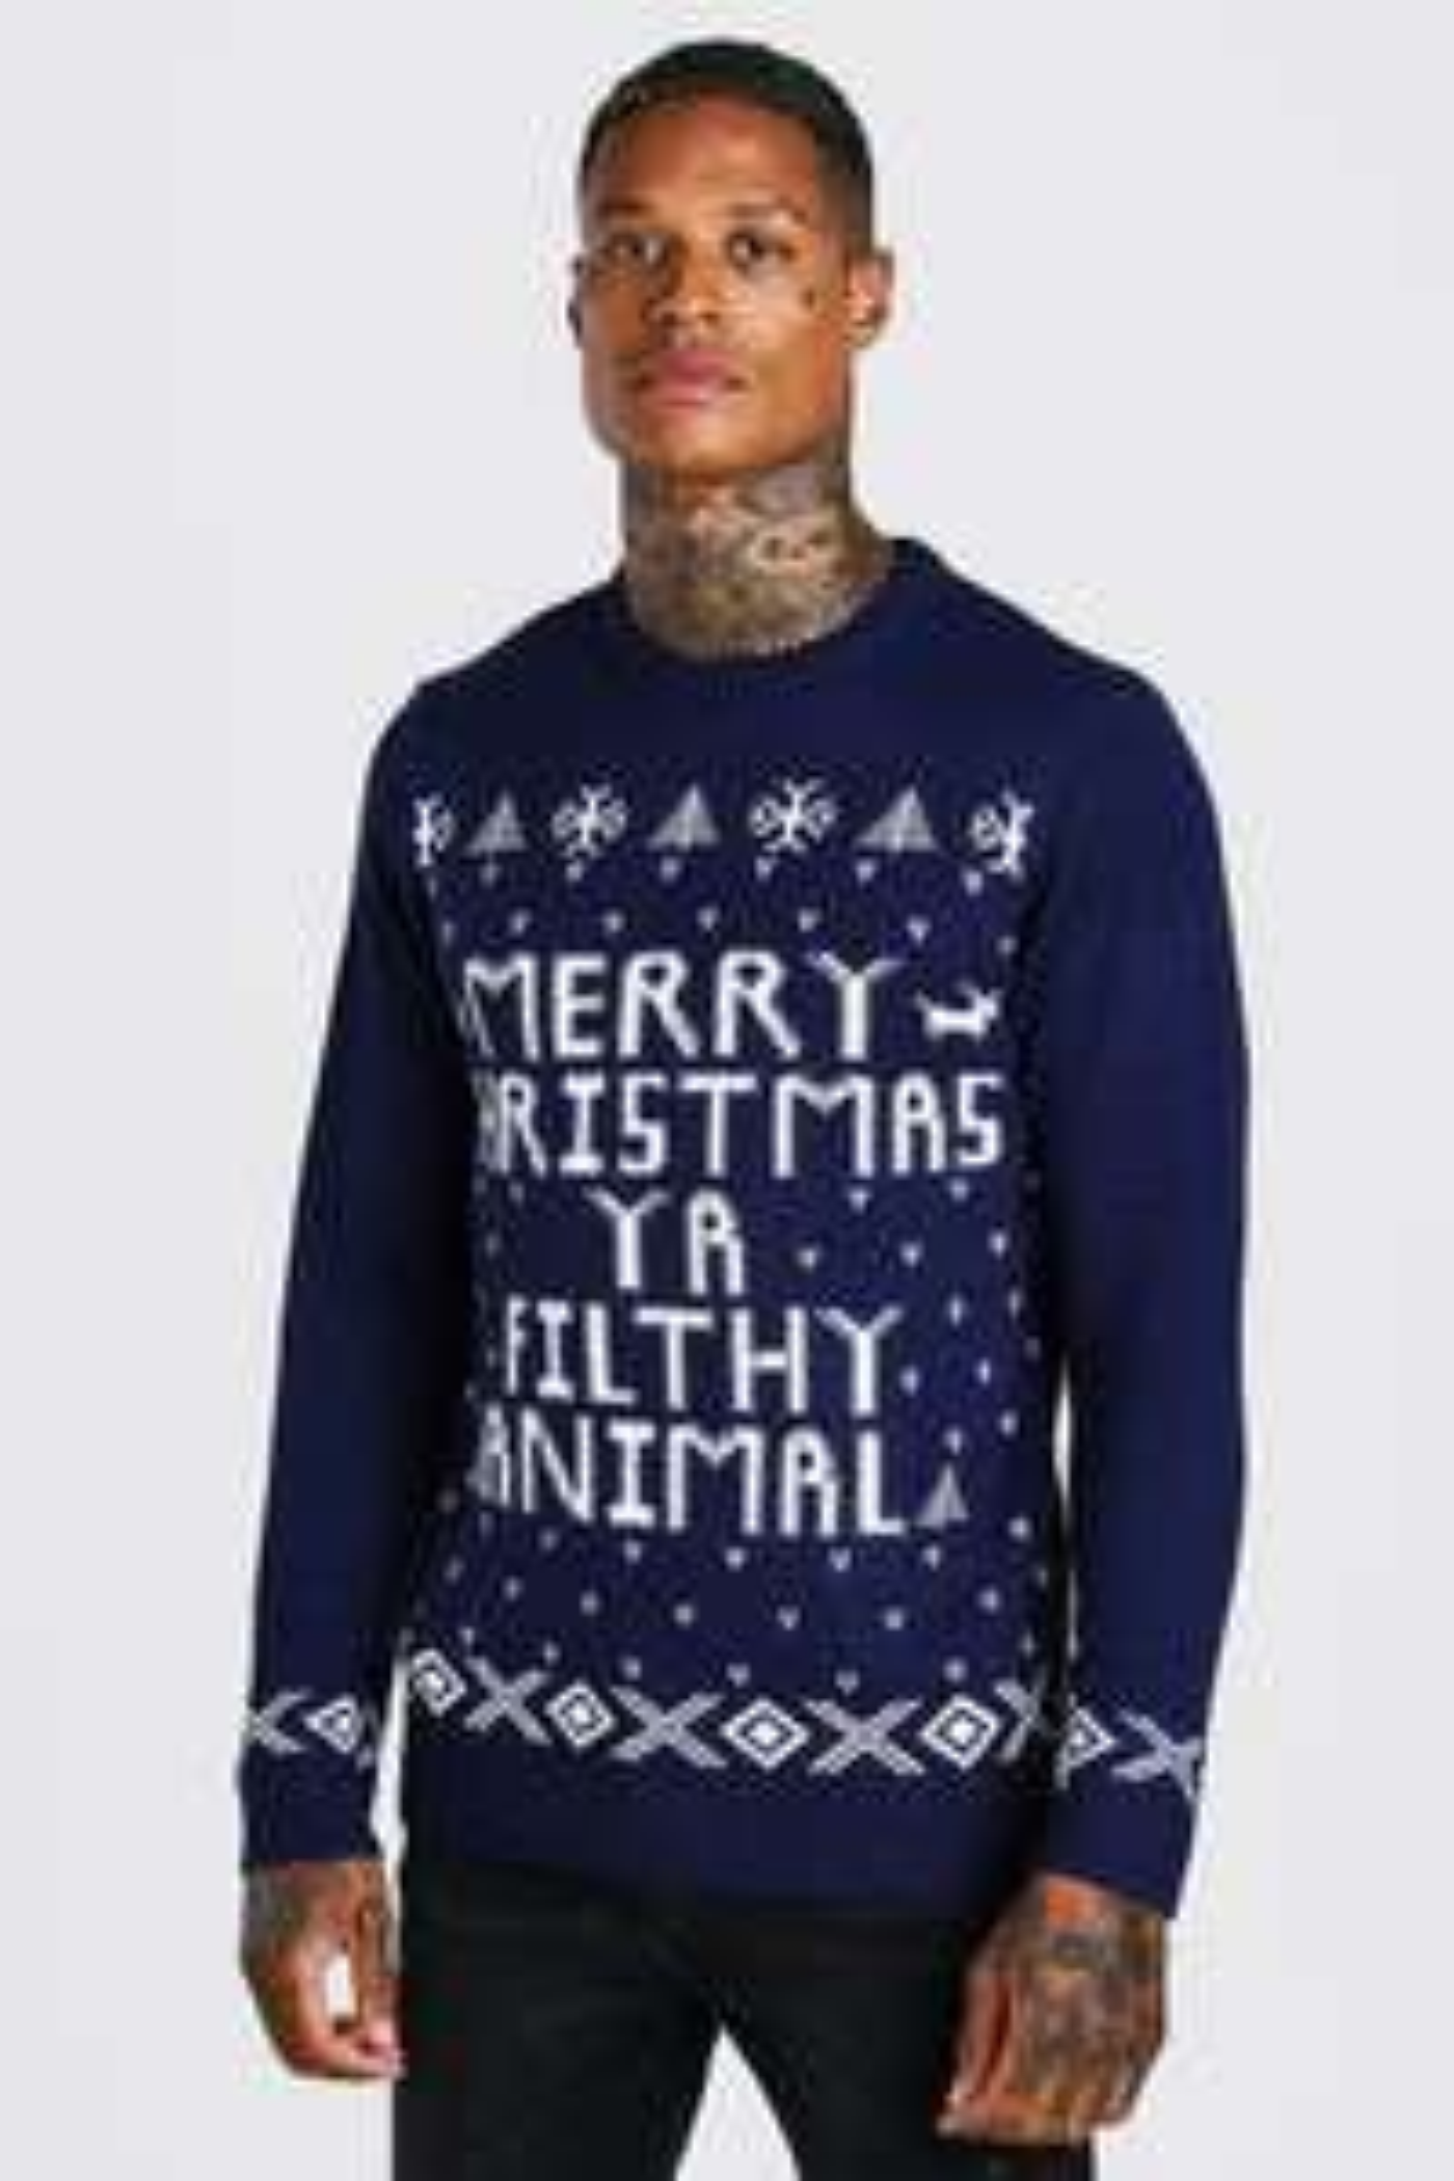 Merry Christmas Ya Filthy Animal Christmas Jumper £9 + £3.99 delivery @ BoohooMAN